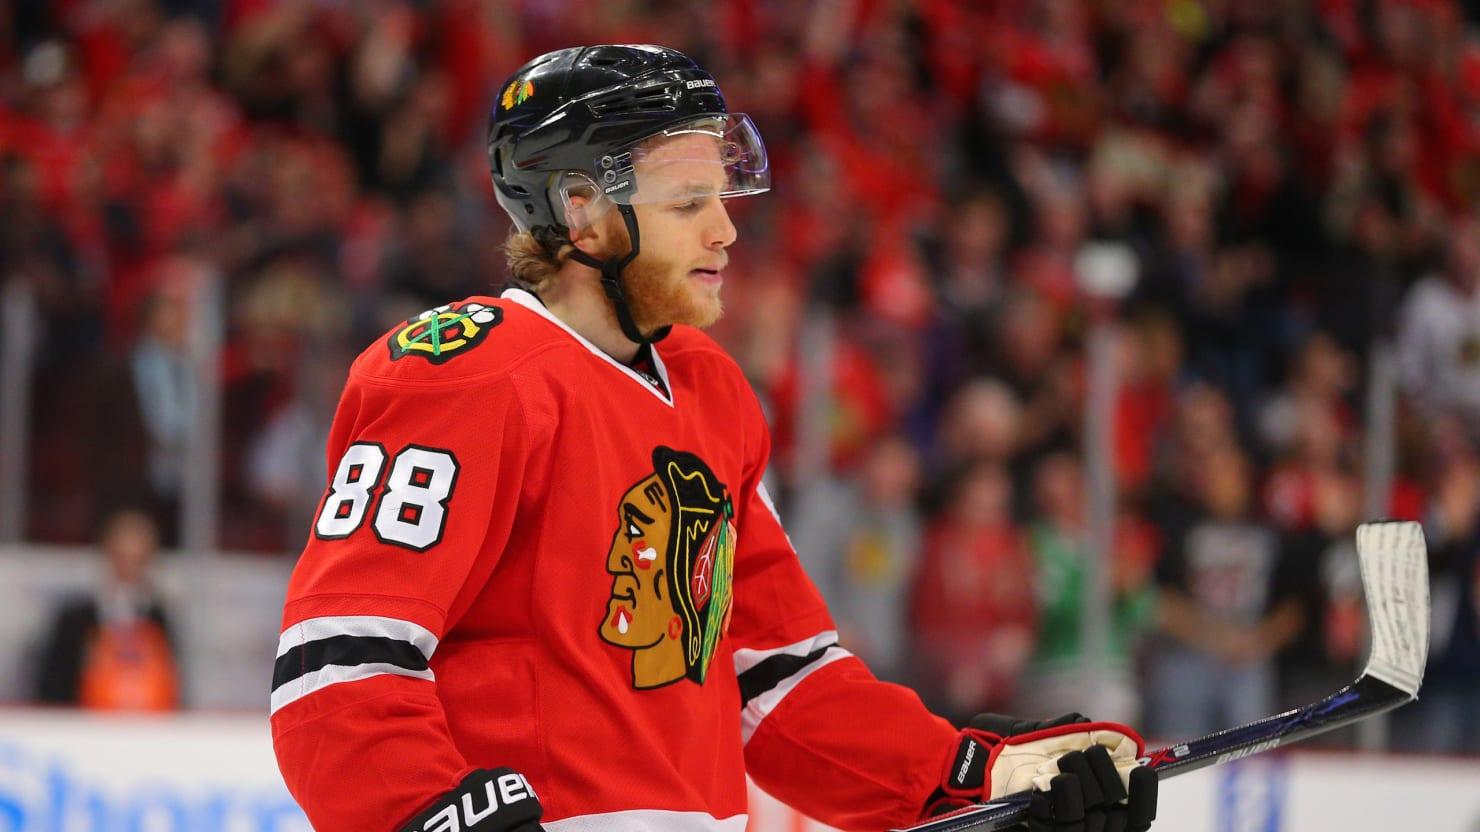 Lawyer: Rape Kit in NHL Case Tampered